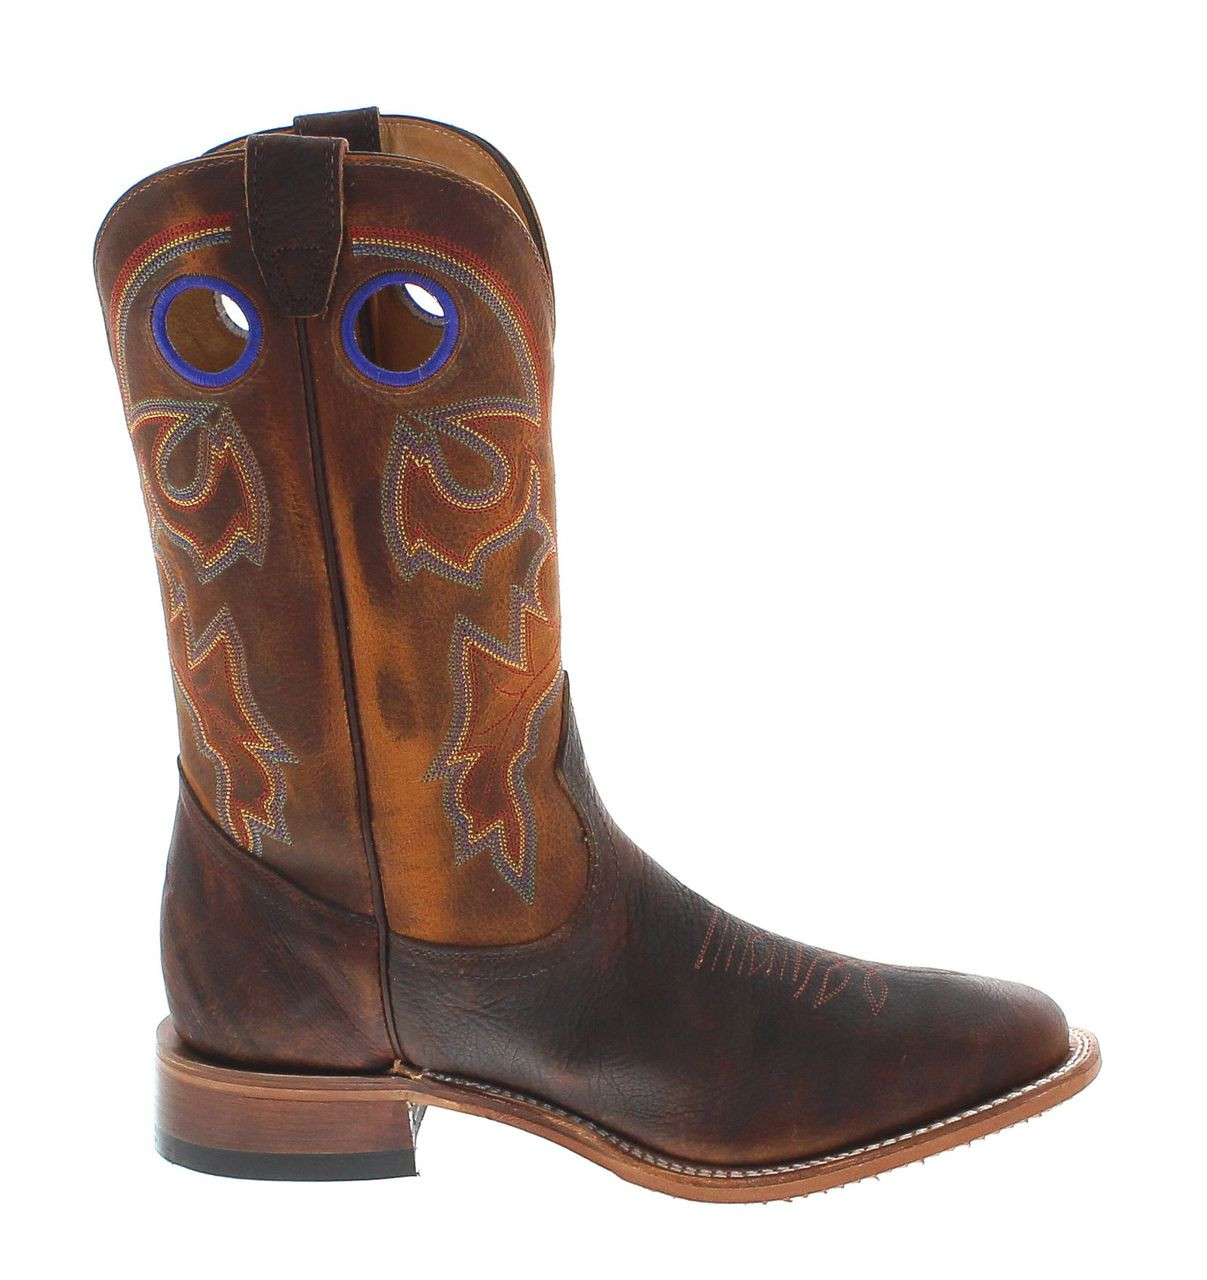 783a5374 Boulet Mens Bison Brown Shrunken Old Town Wide Square Toe Cowboy Boots 6369